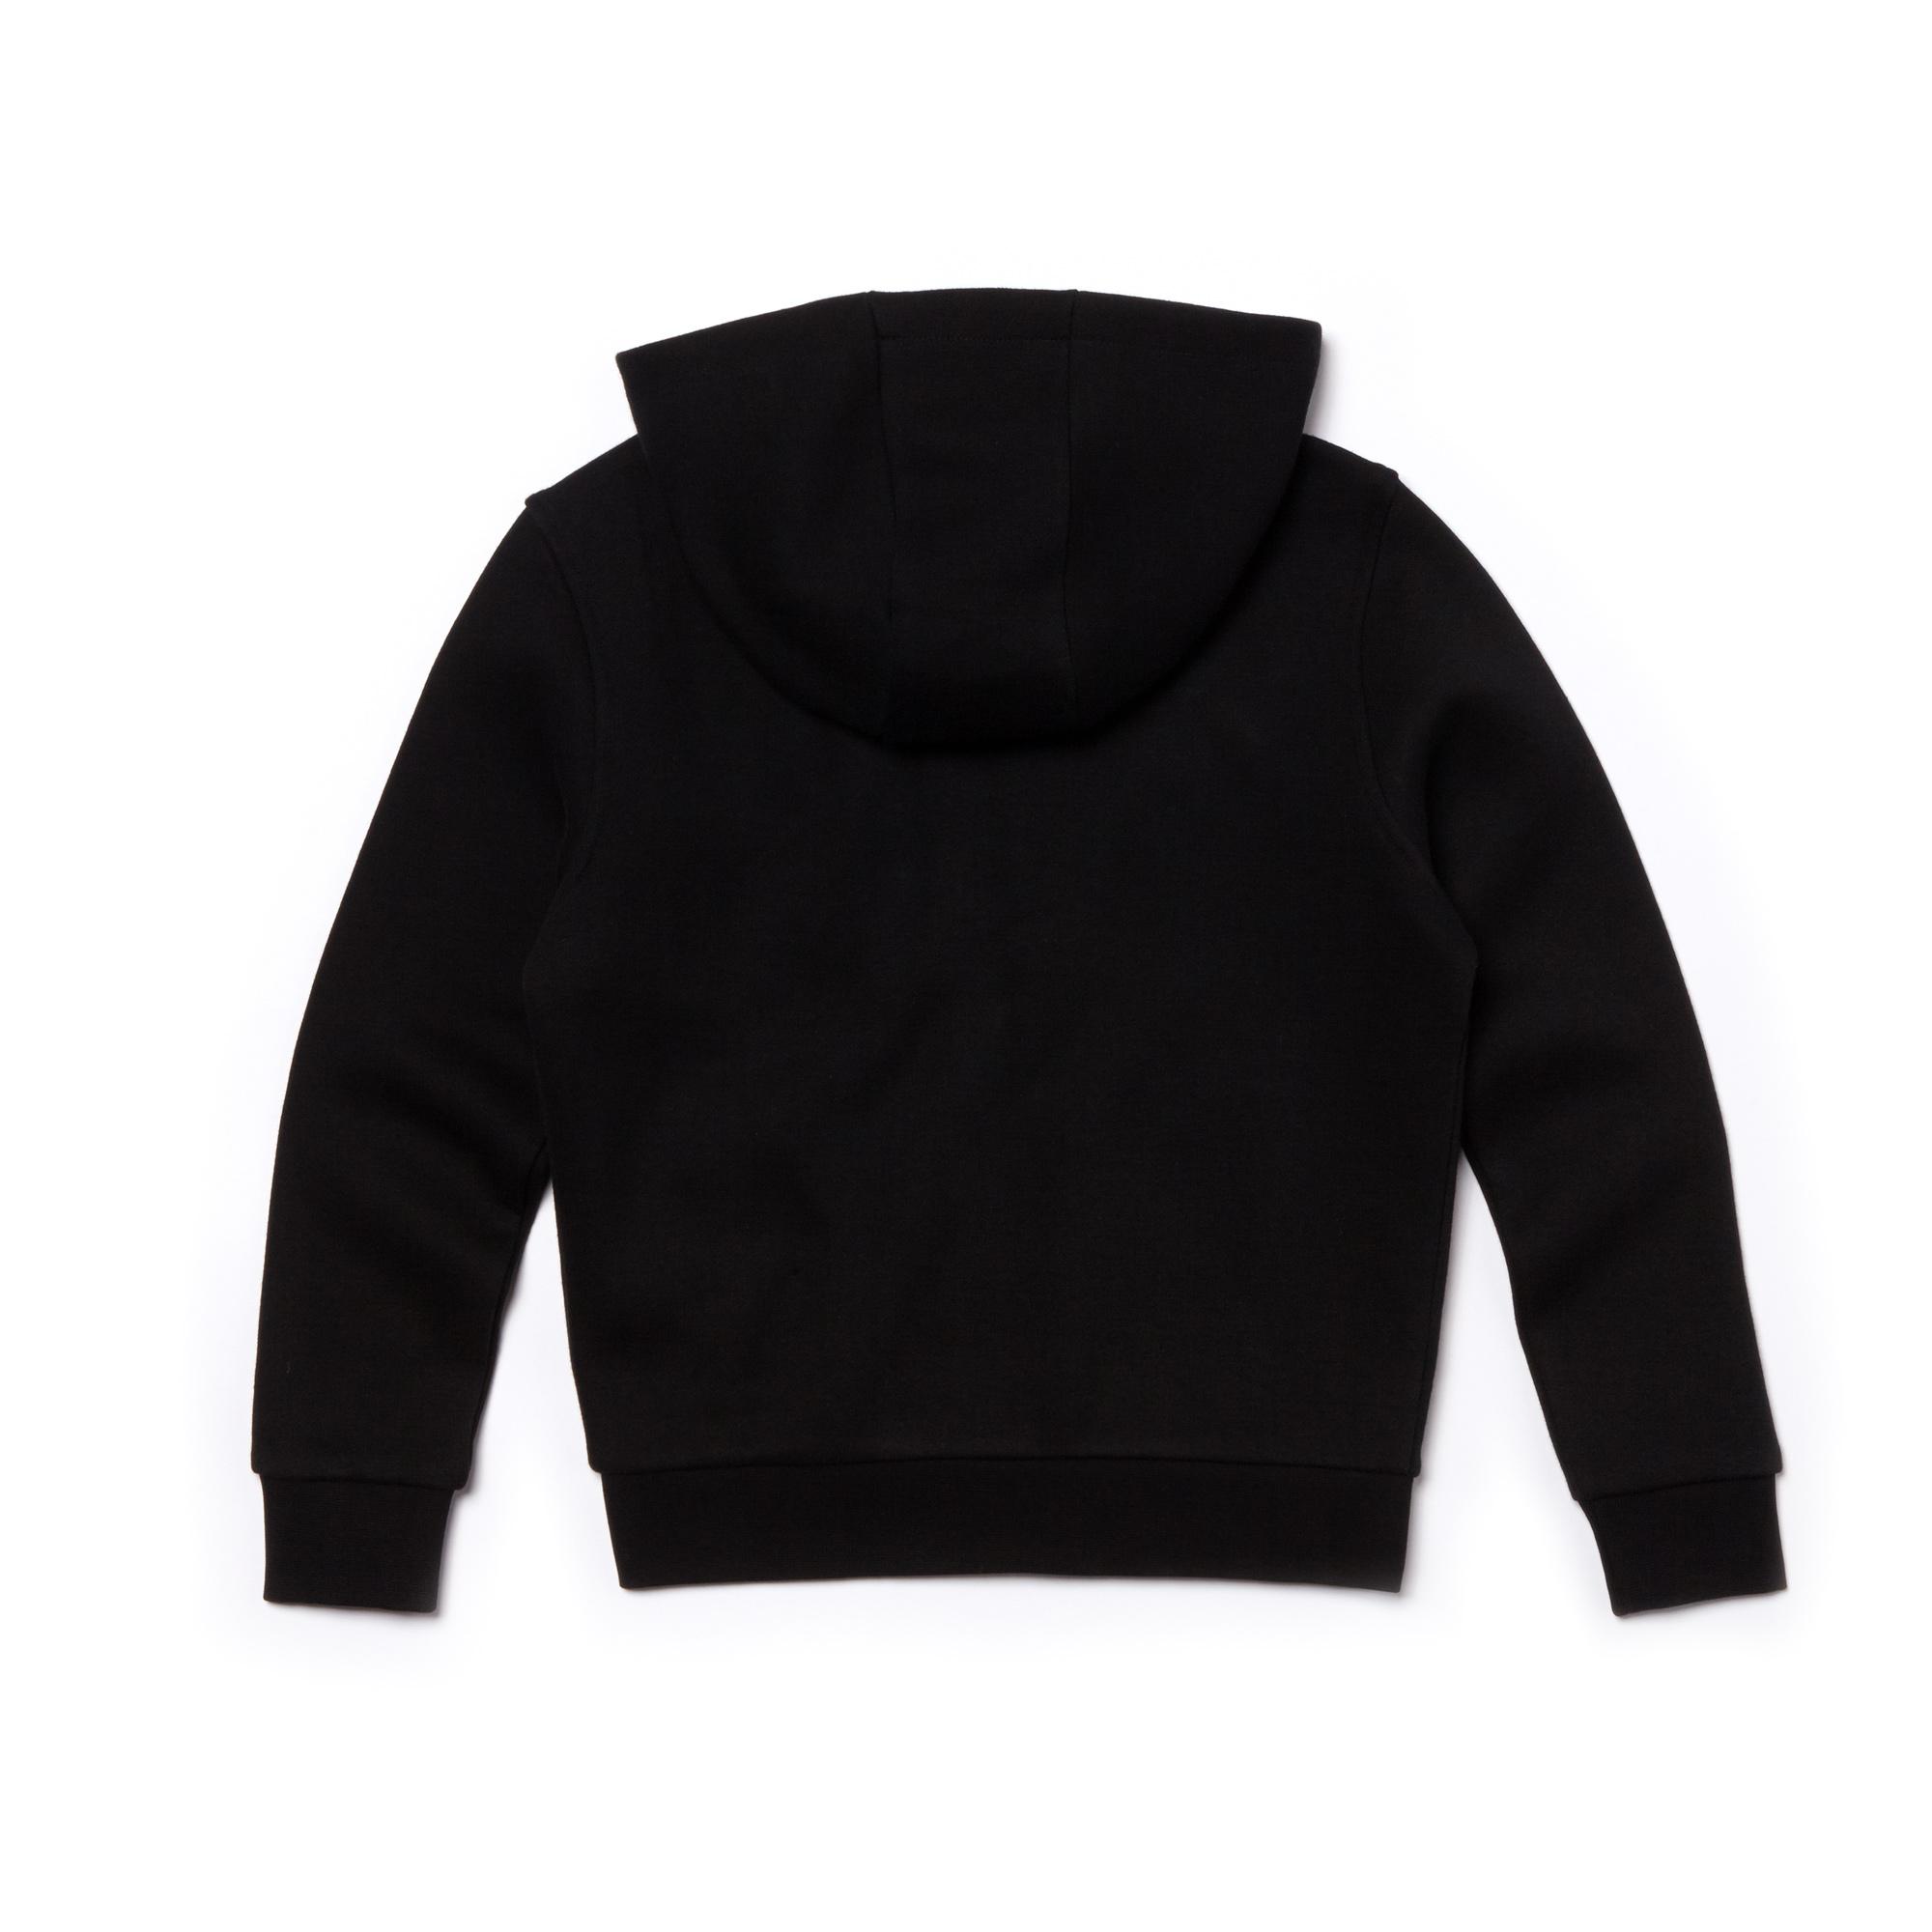 Lacoste Kids Sweatshirt, sort, 6 år